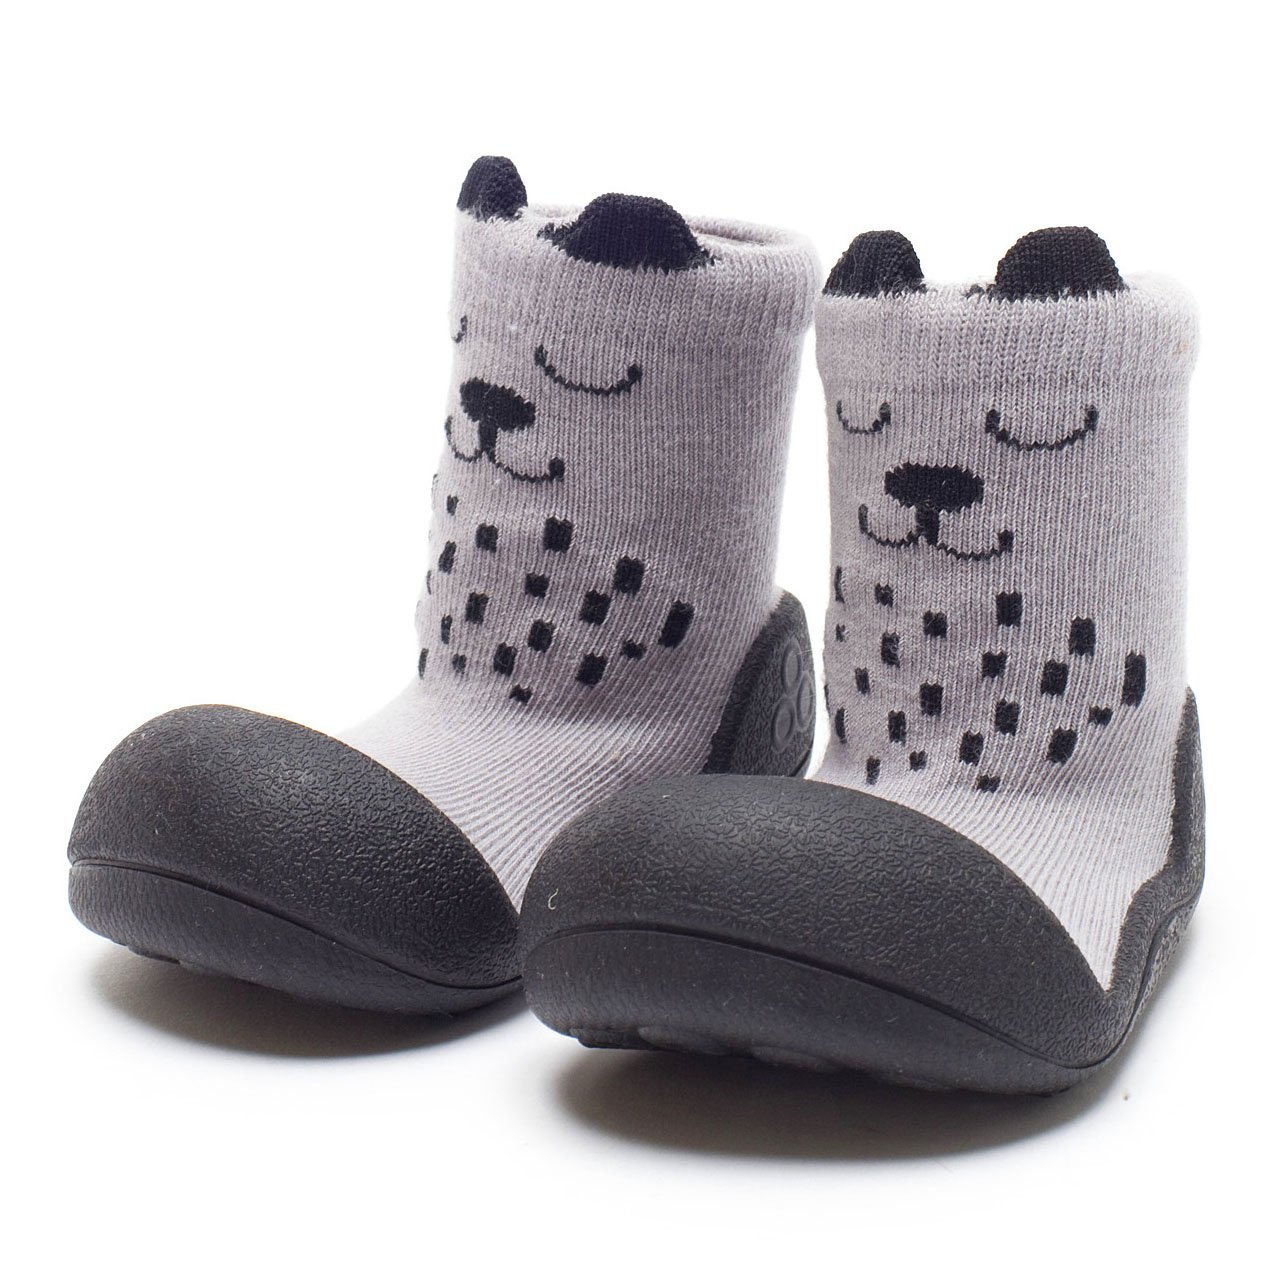 Attipas A17C, Zapatos Primeros Pasos, Gris (Cutie Gray), 20 EU (